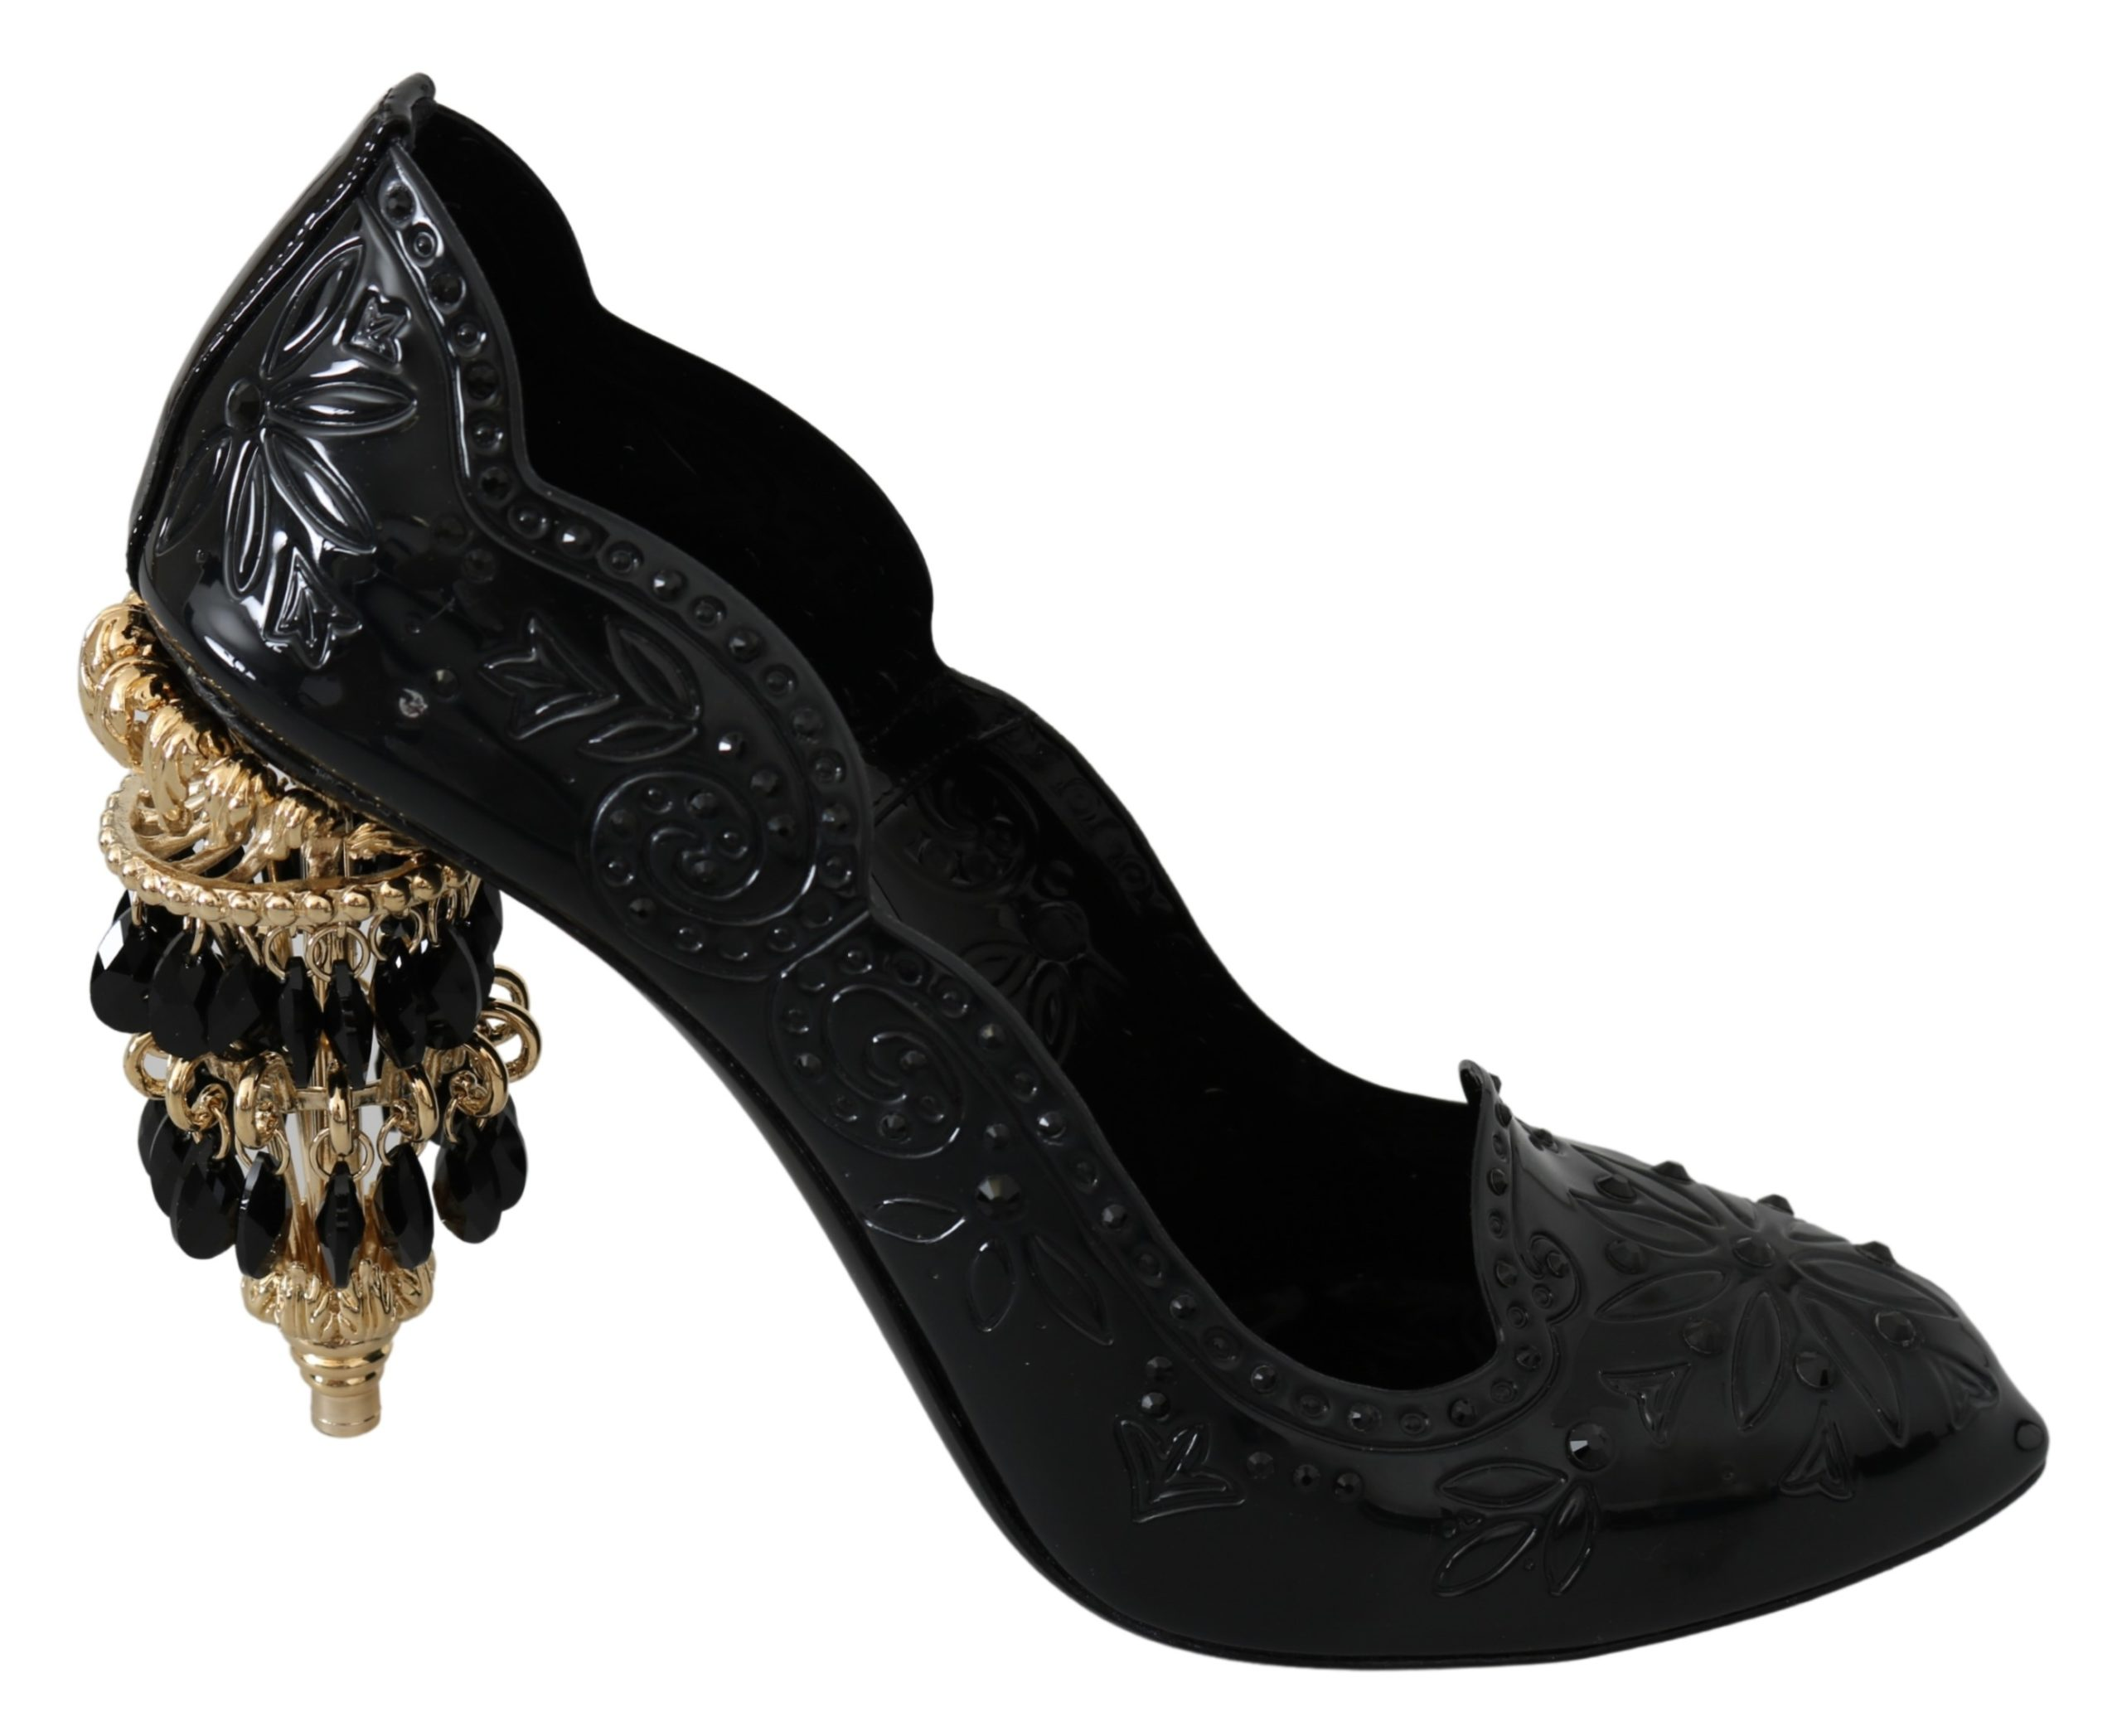 Dolce & Gabbana Women's Crystal Floral CINDERELLA Pumps Black LA7522 - EU40/US9.5